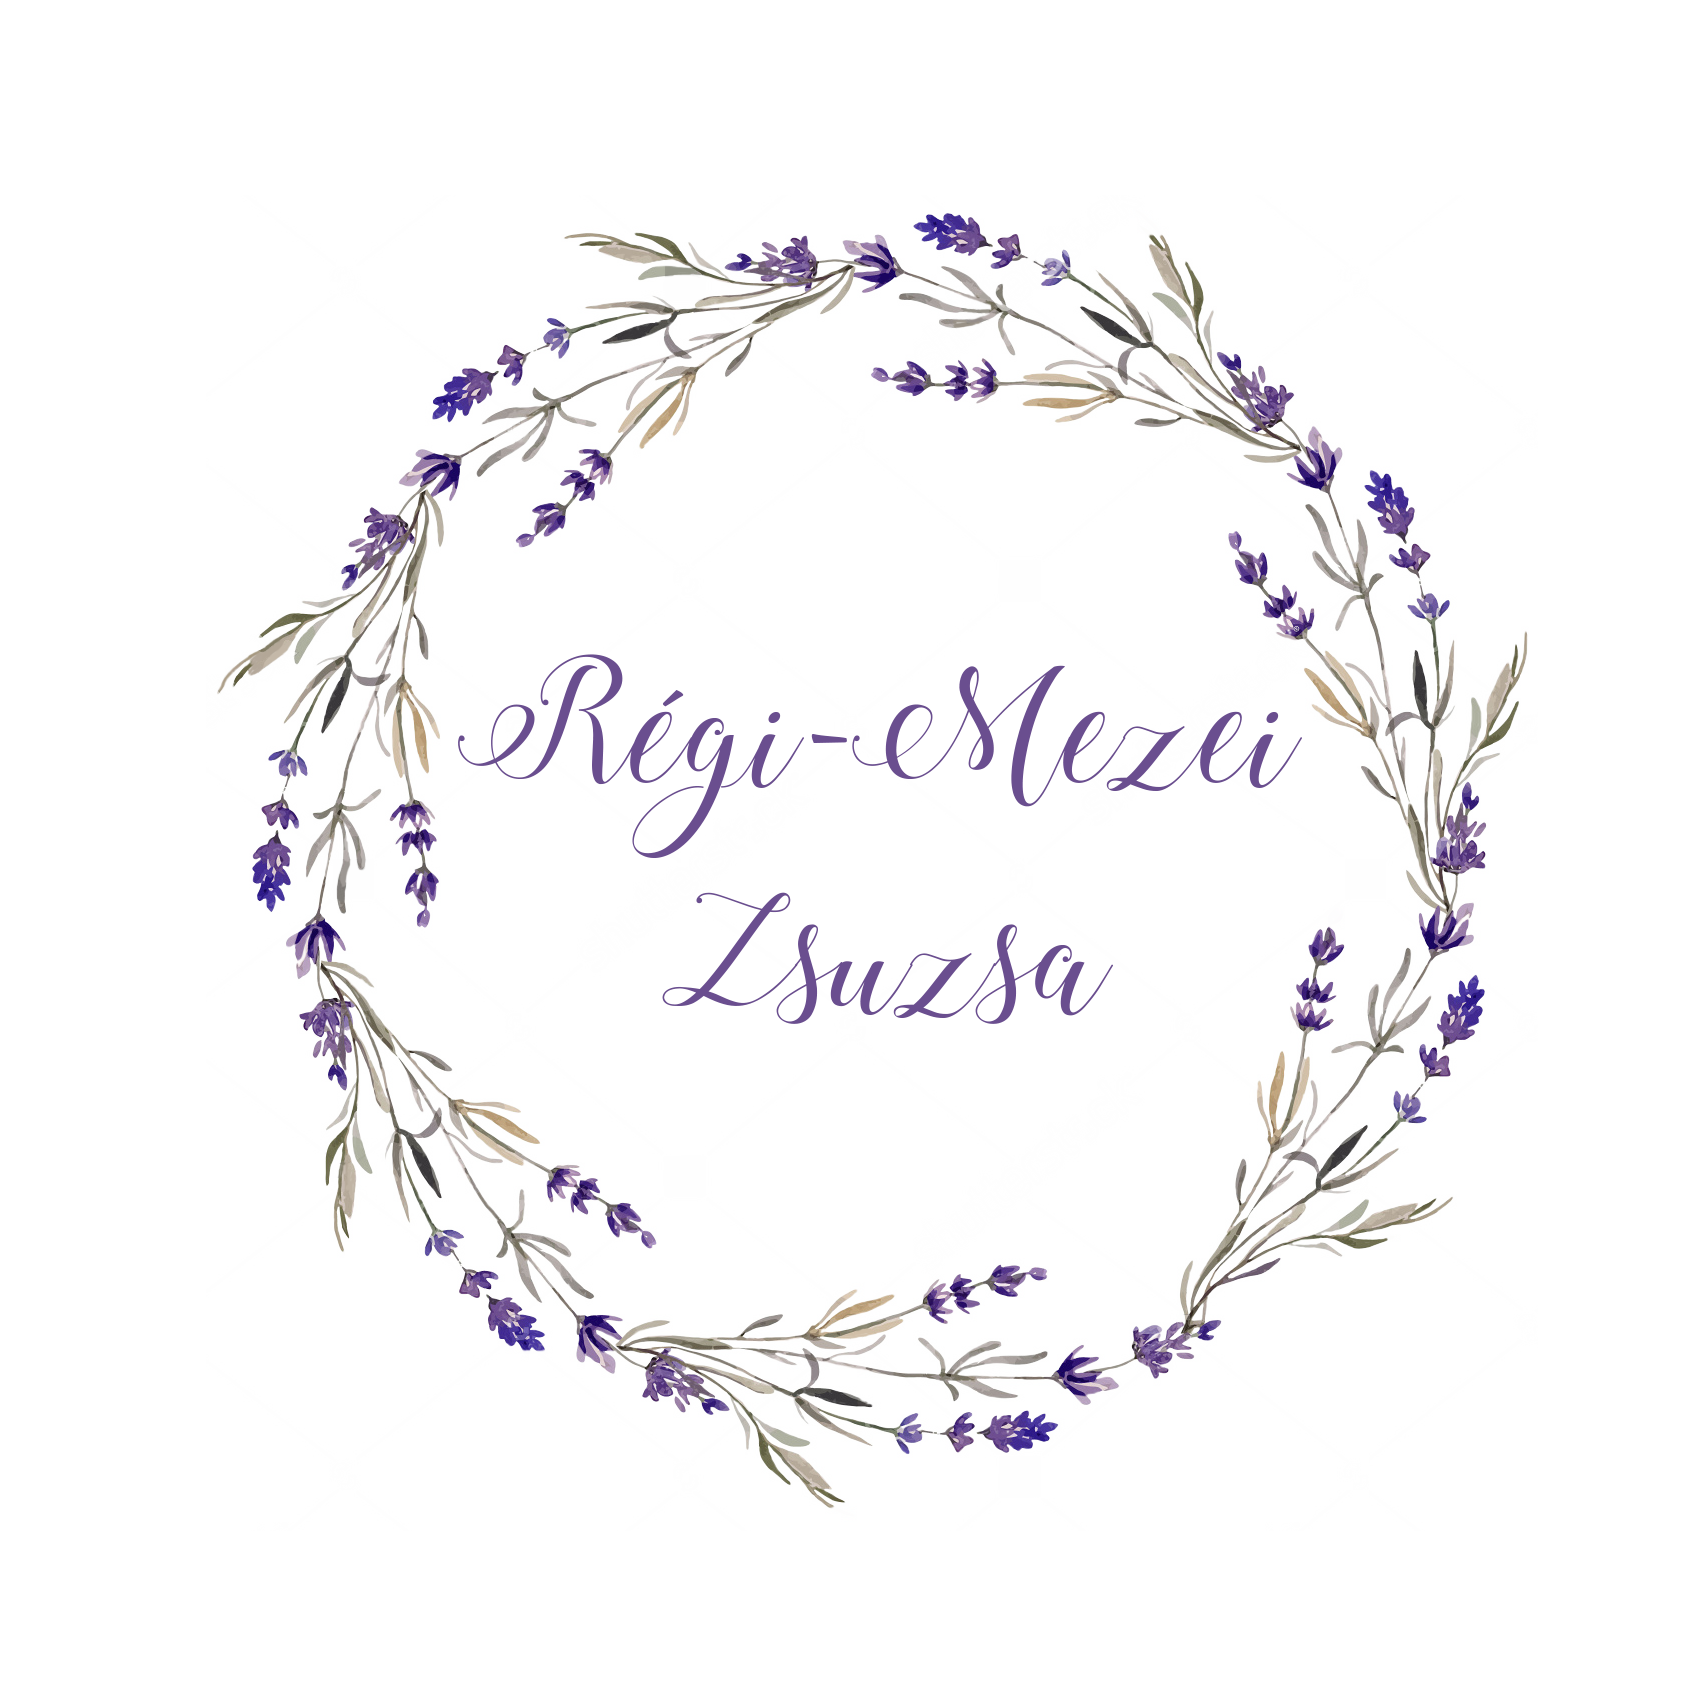 logo_stylish_calligr.png